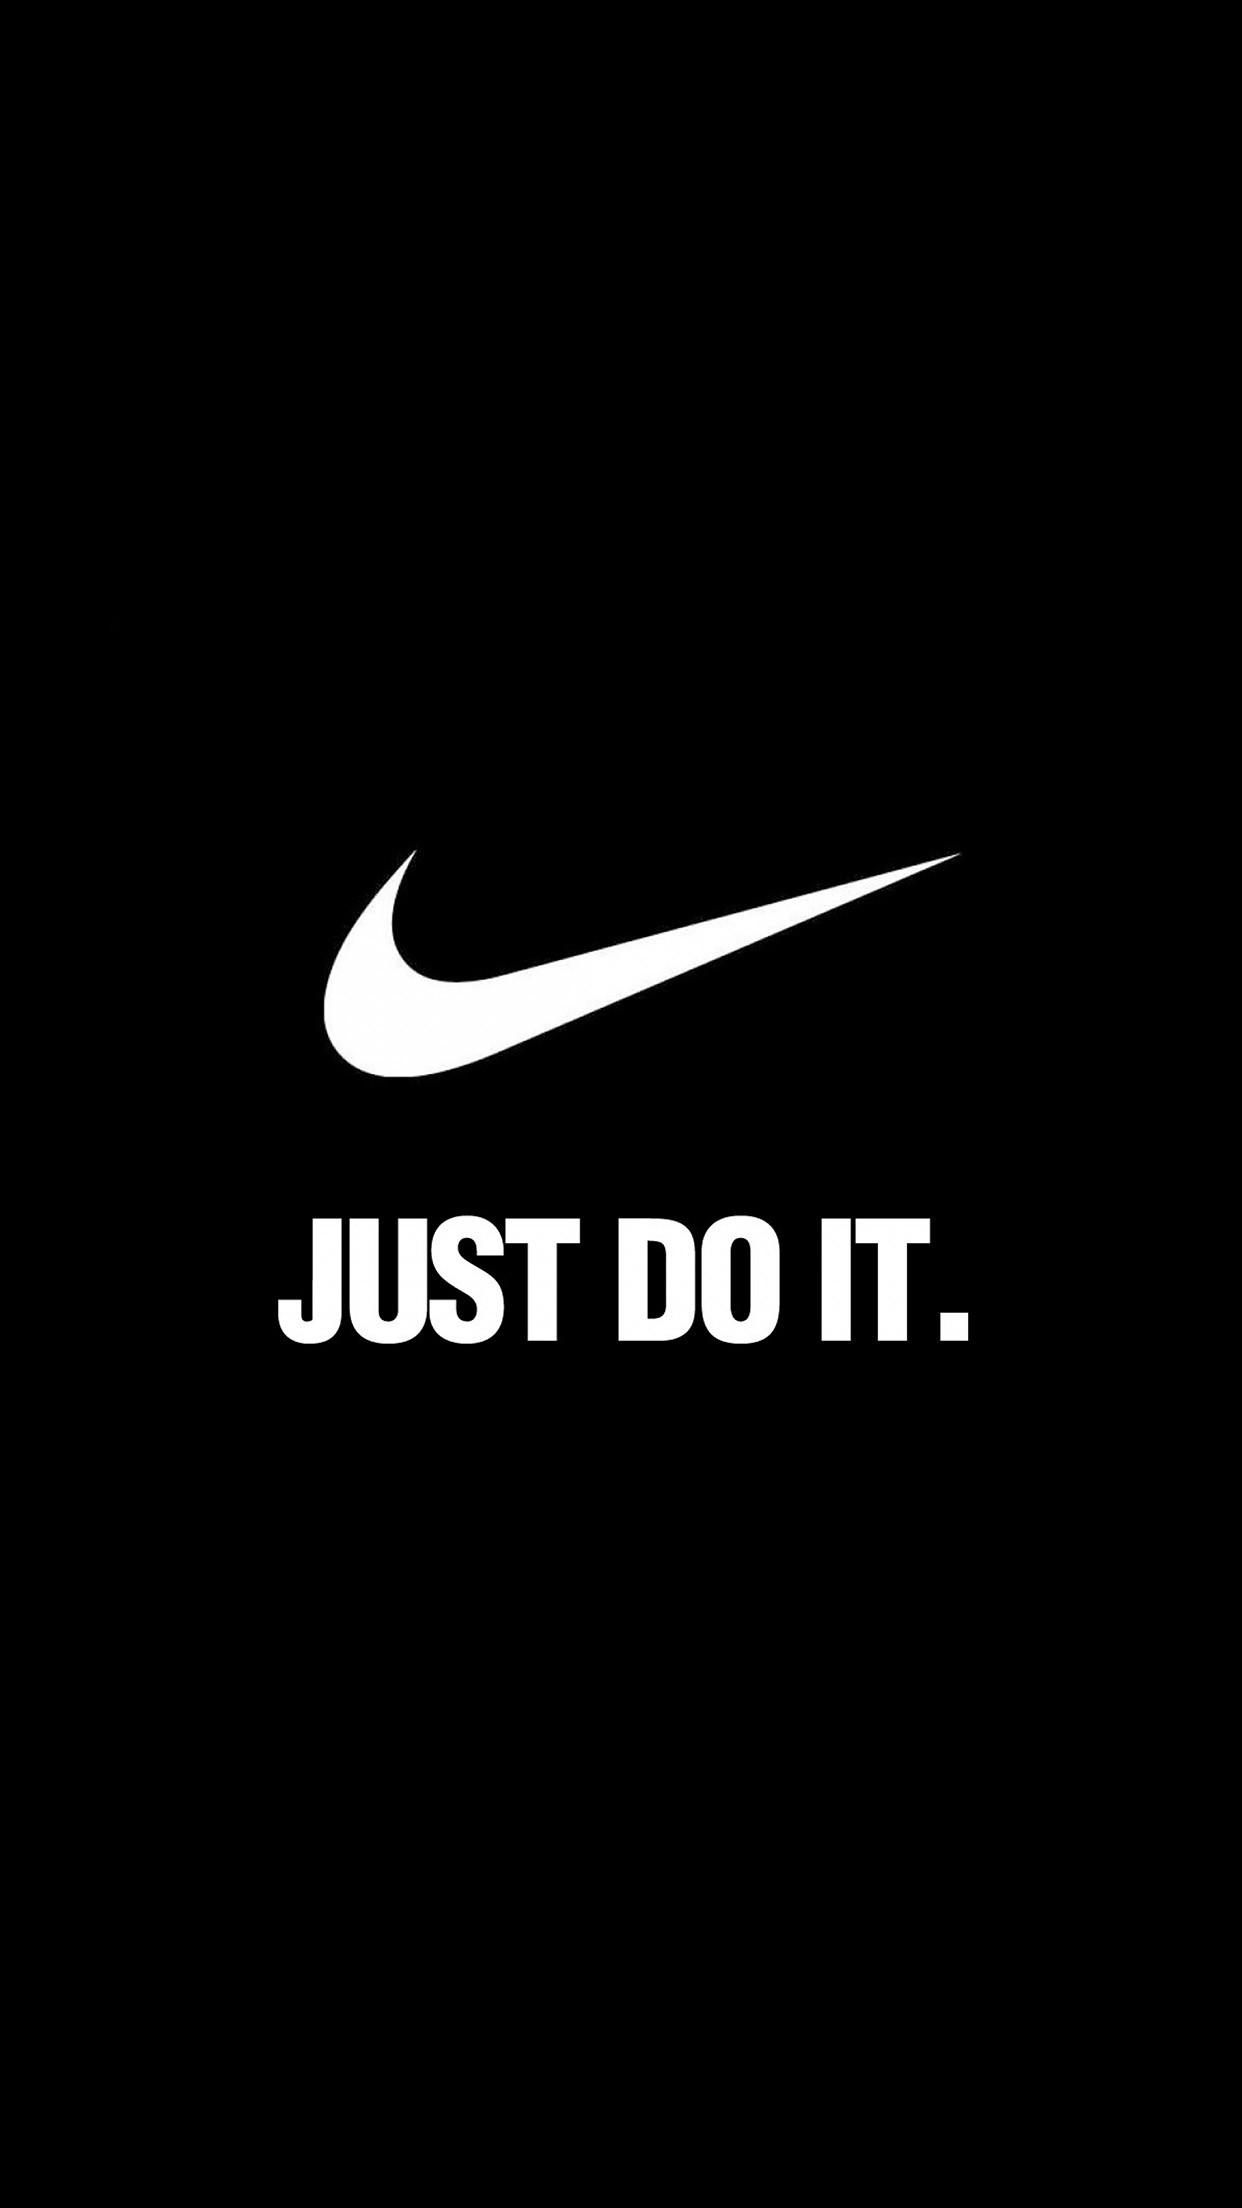 Logo Nike Brand Just Do It Motivation. Nike Wallpaper IphoneIphone …